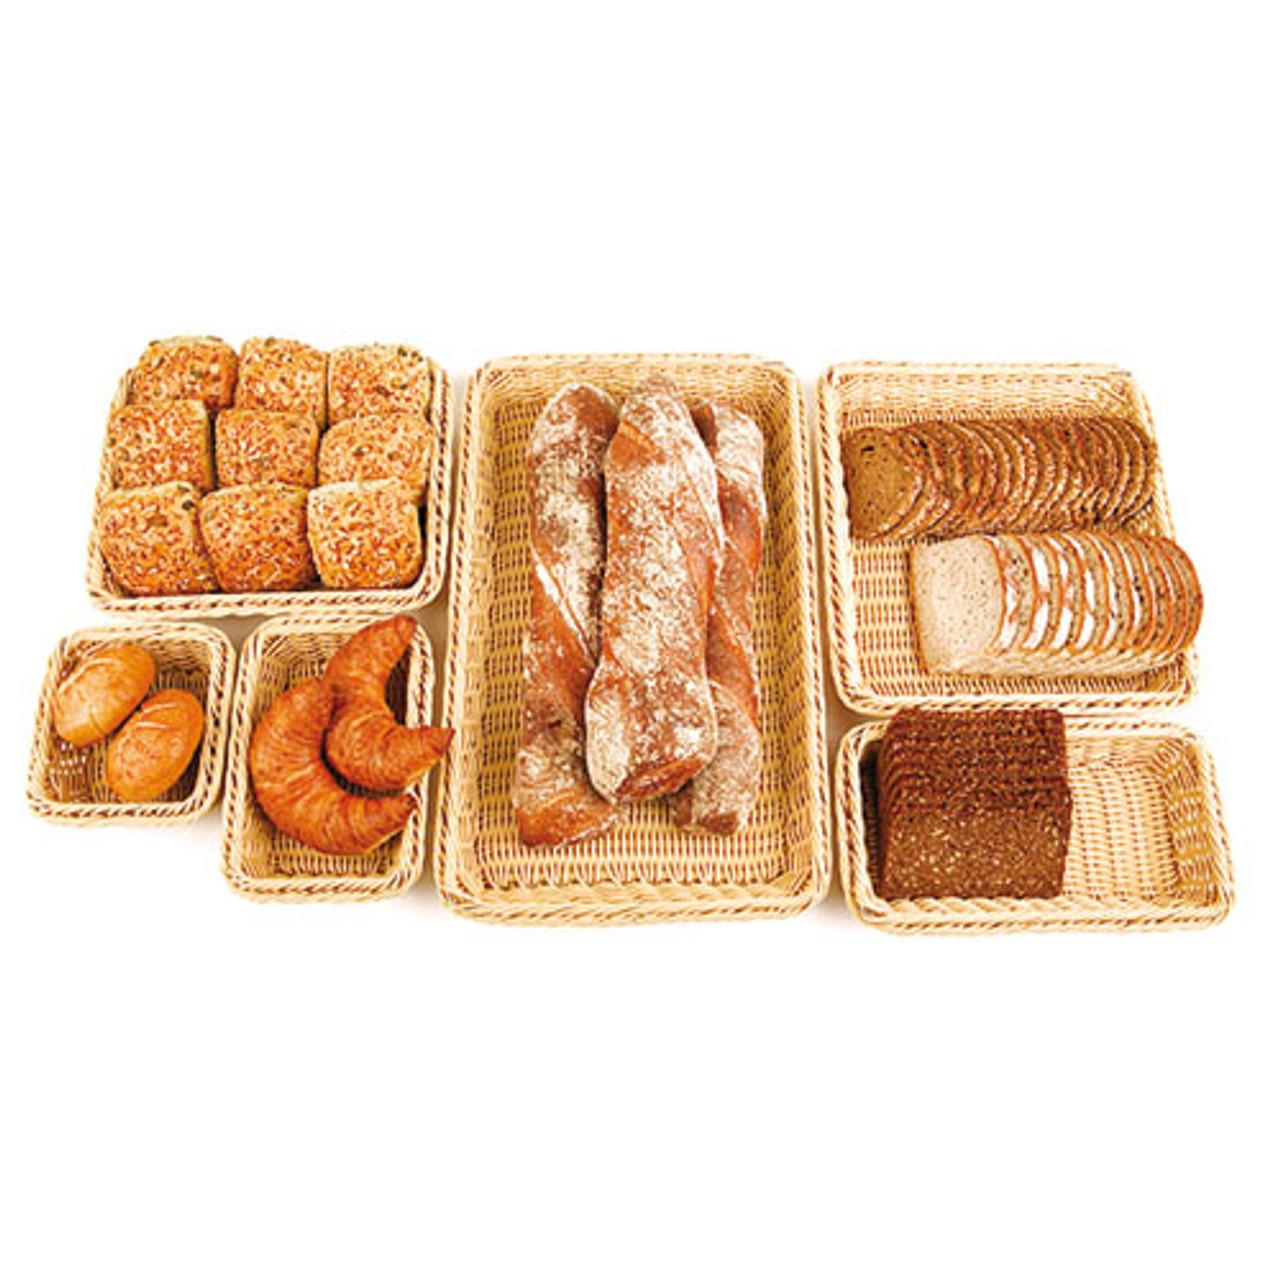 "Polyrattan Bread Basket 1/6, L 7"" X W 6 3/8"" X H 4"""